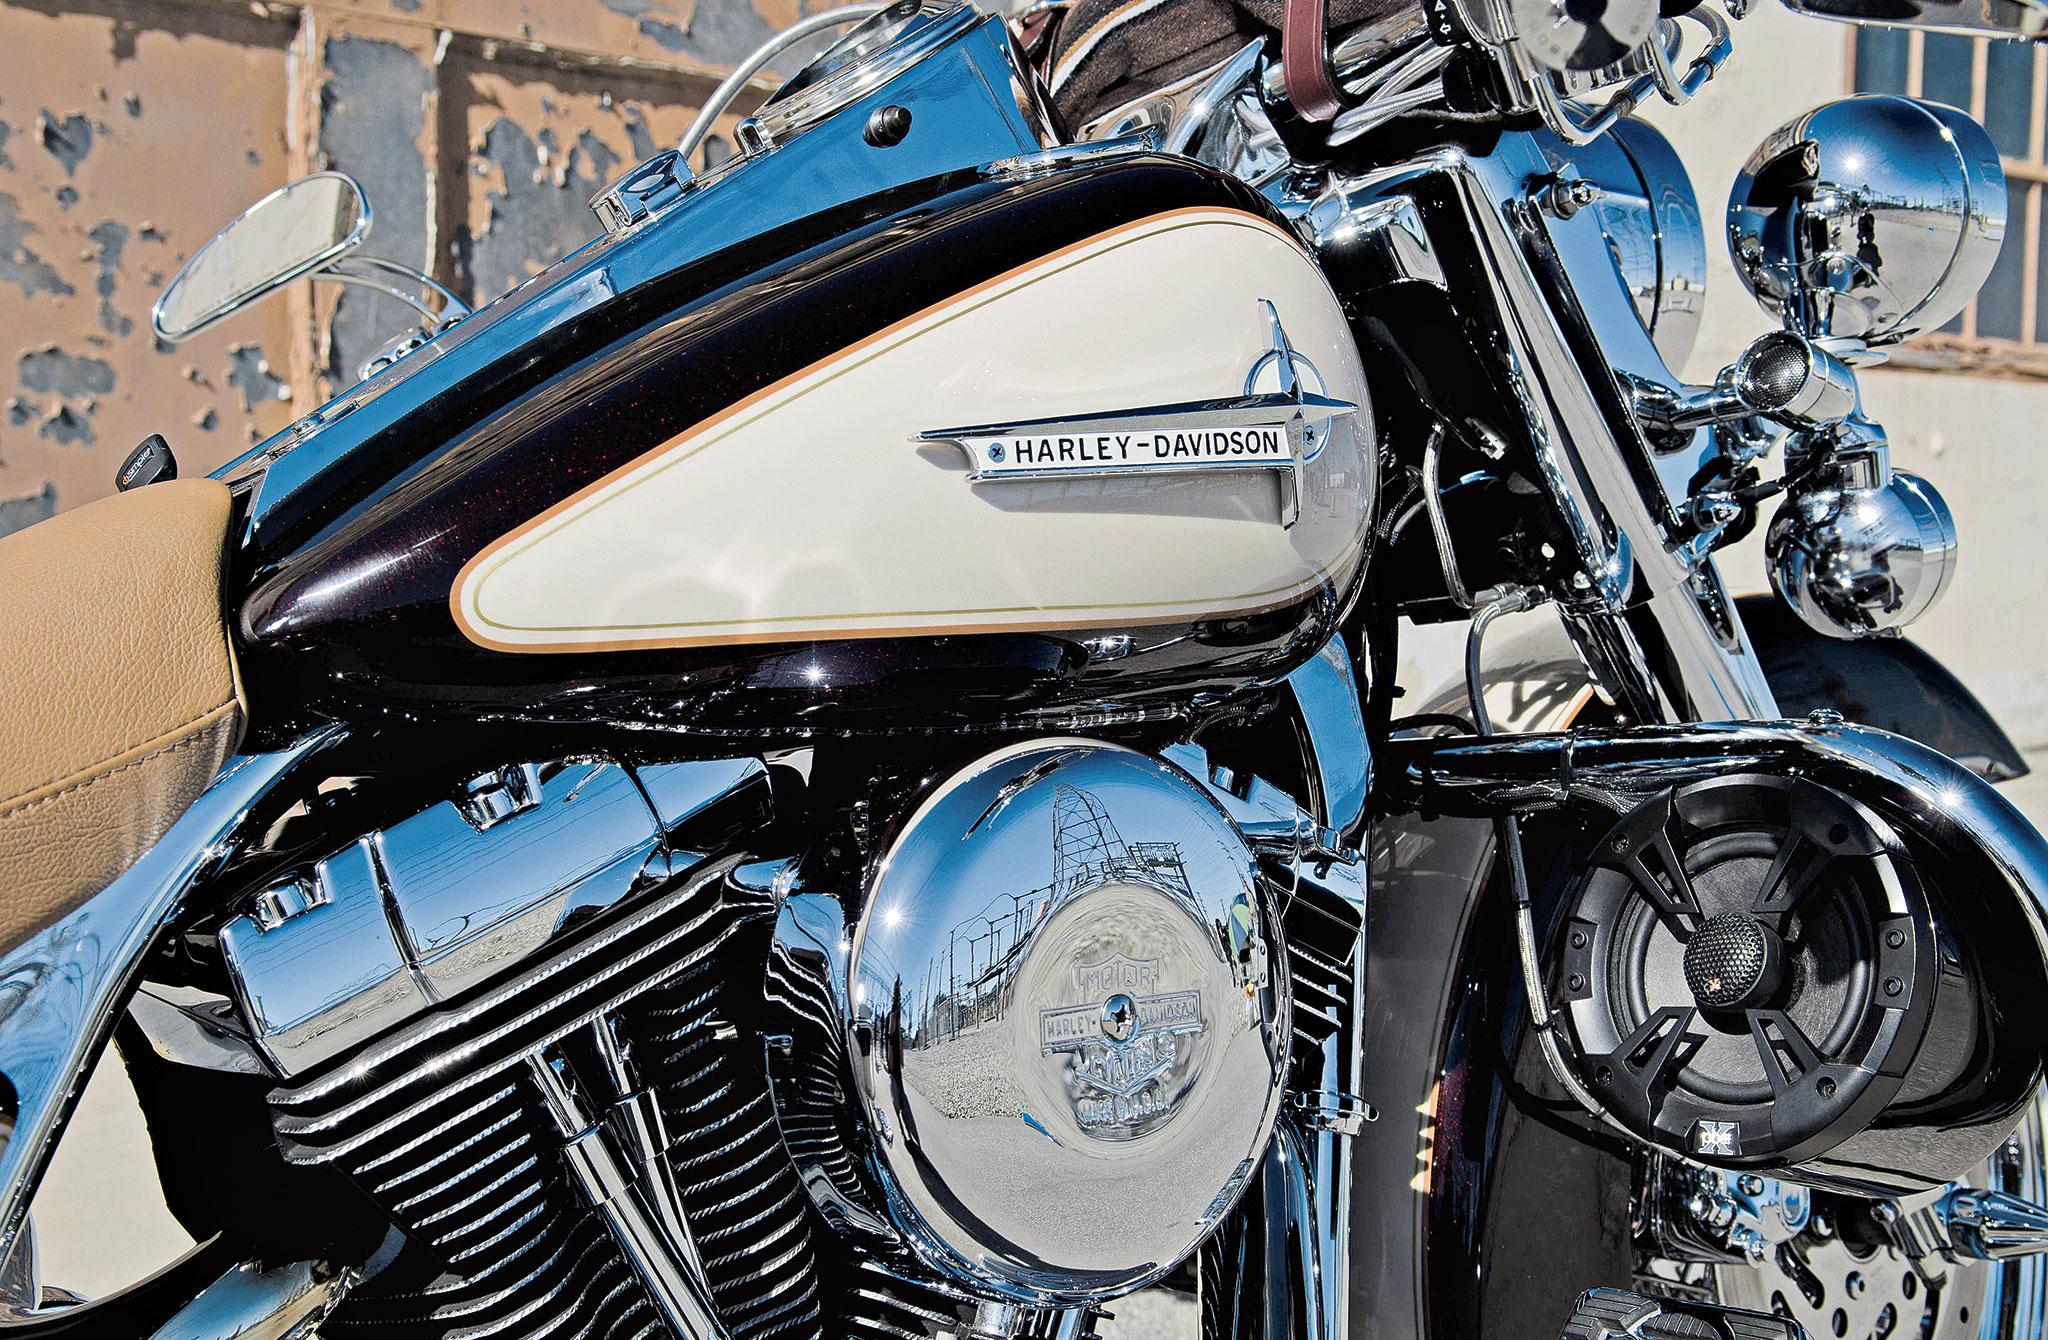 2002 Harley Davidson Road King El Rey Lowrider